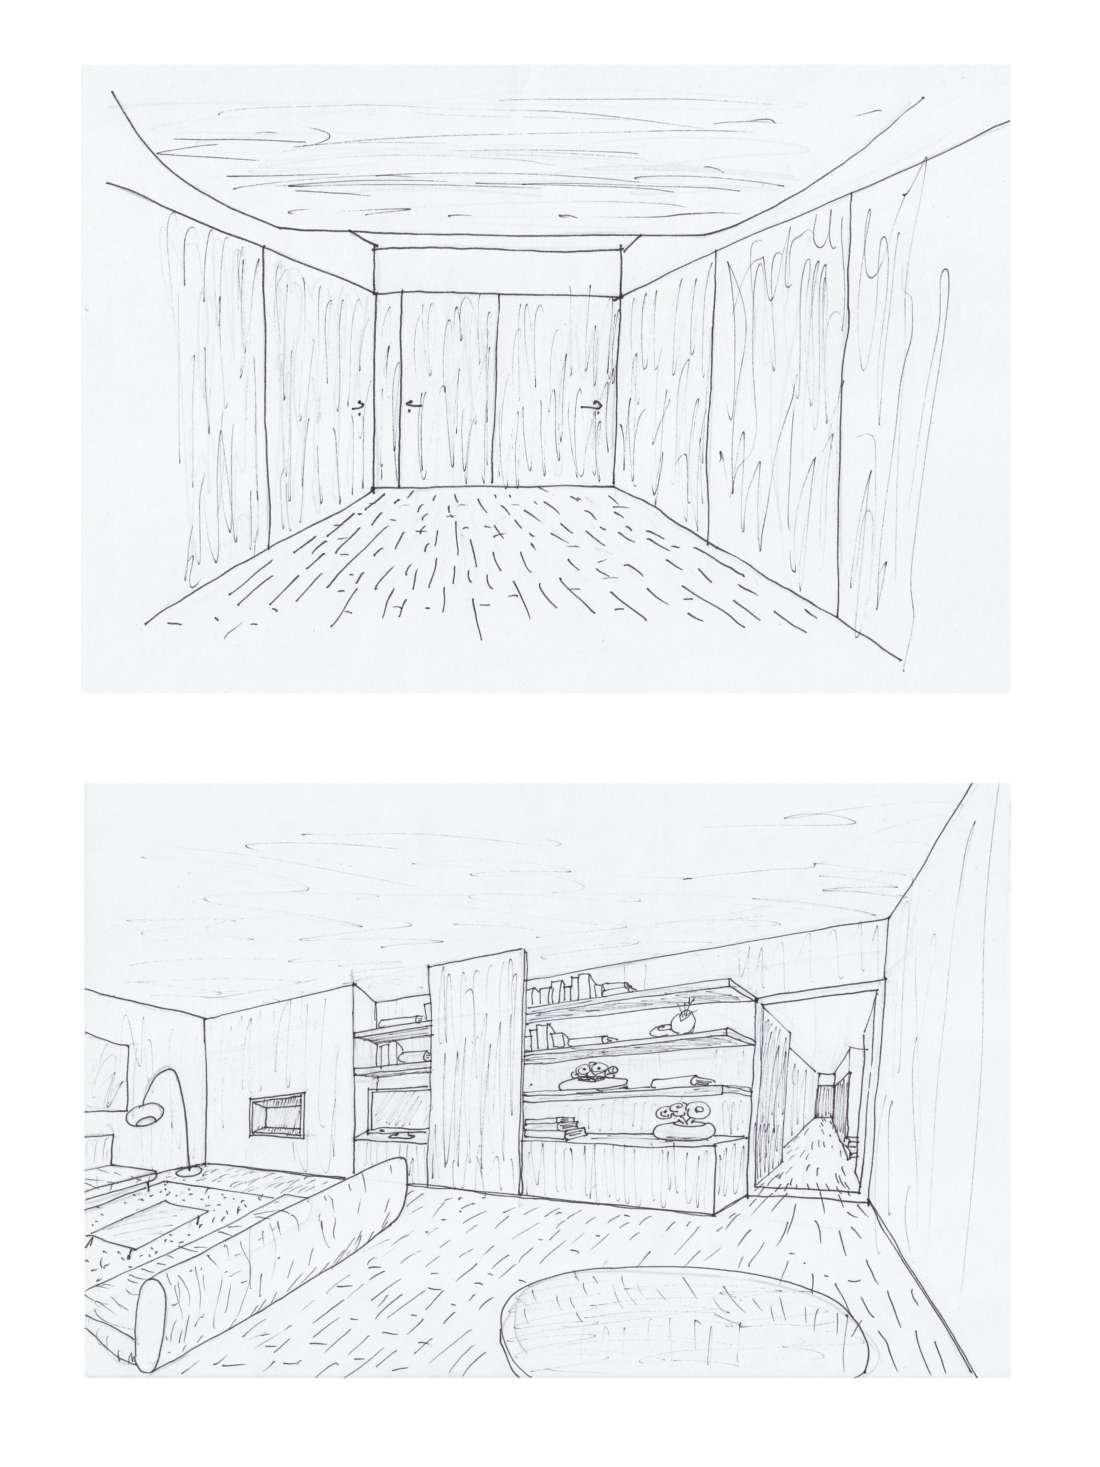 Utopia penthouse renovation for Renovation drawings